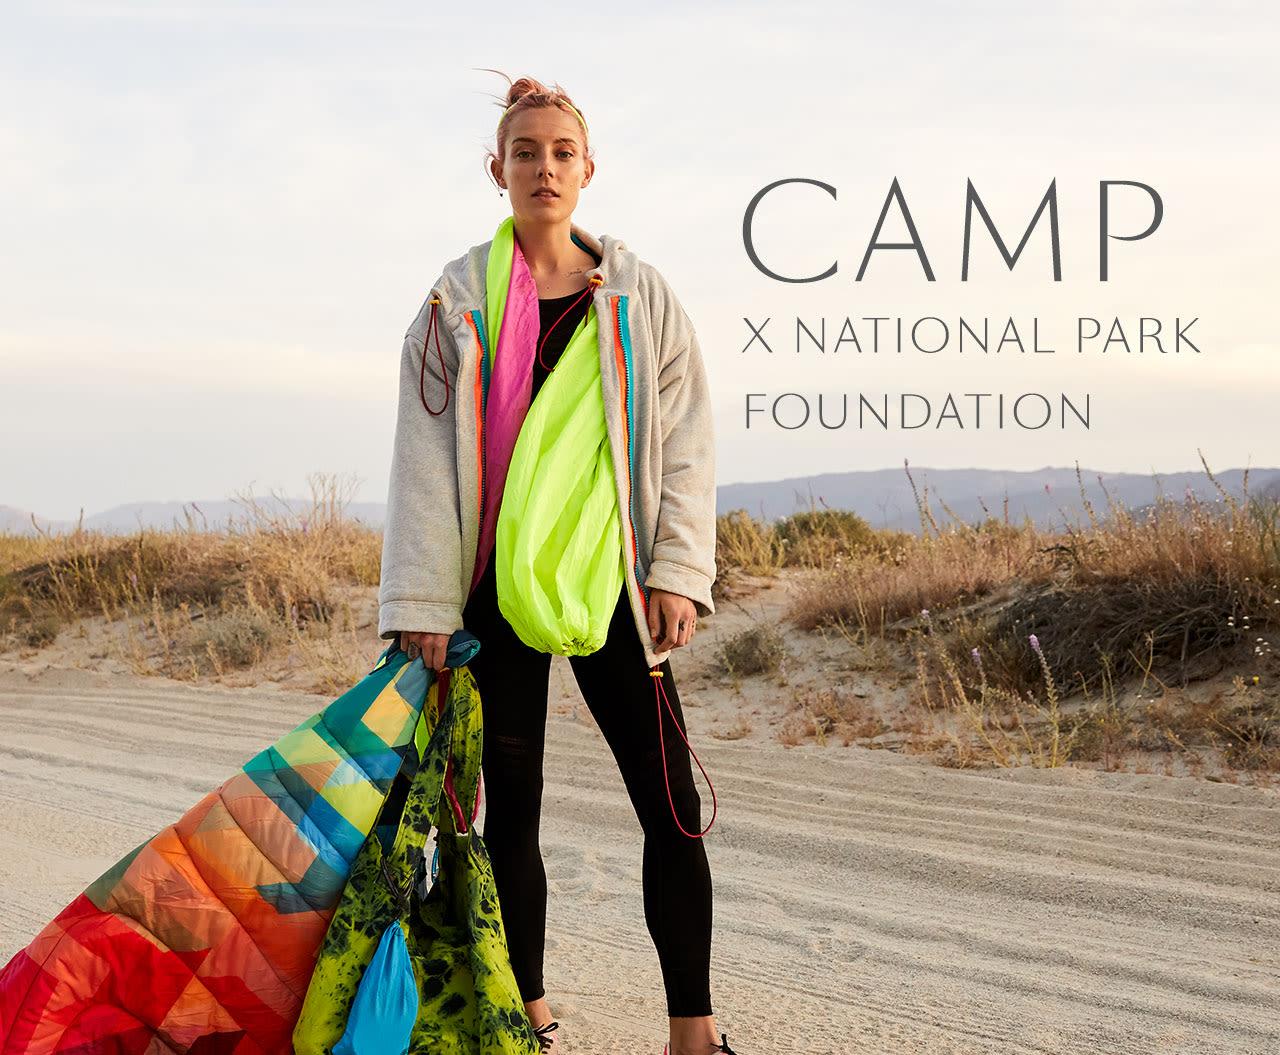 b4563c9c25 Camp x National Park Foundation